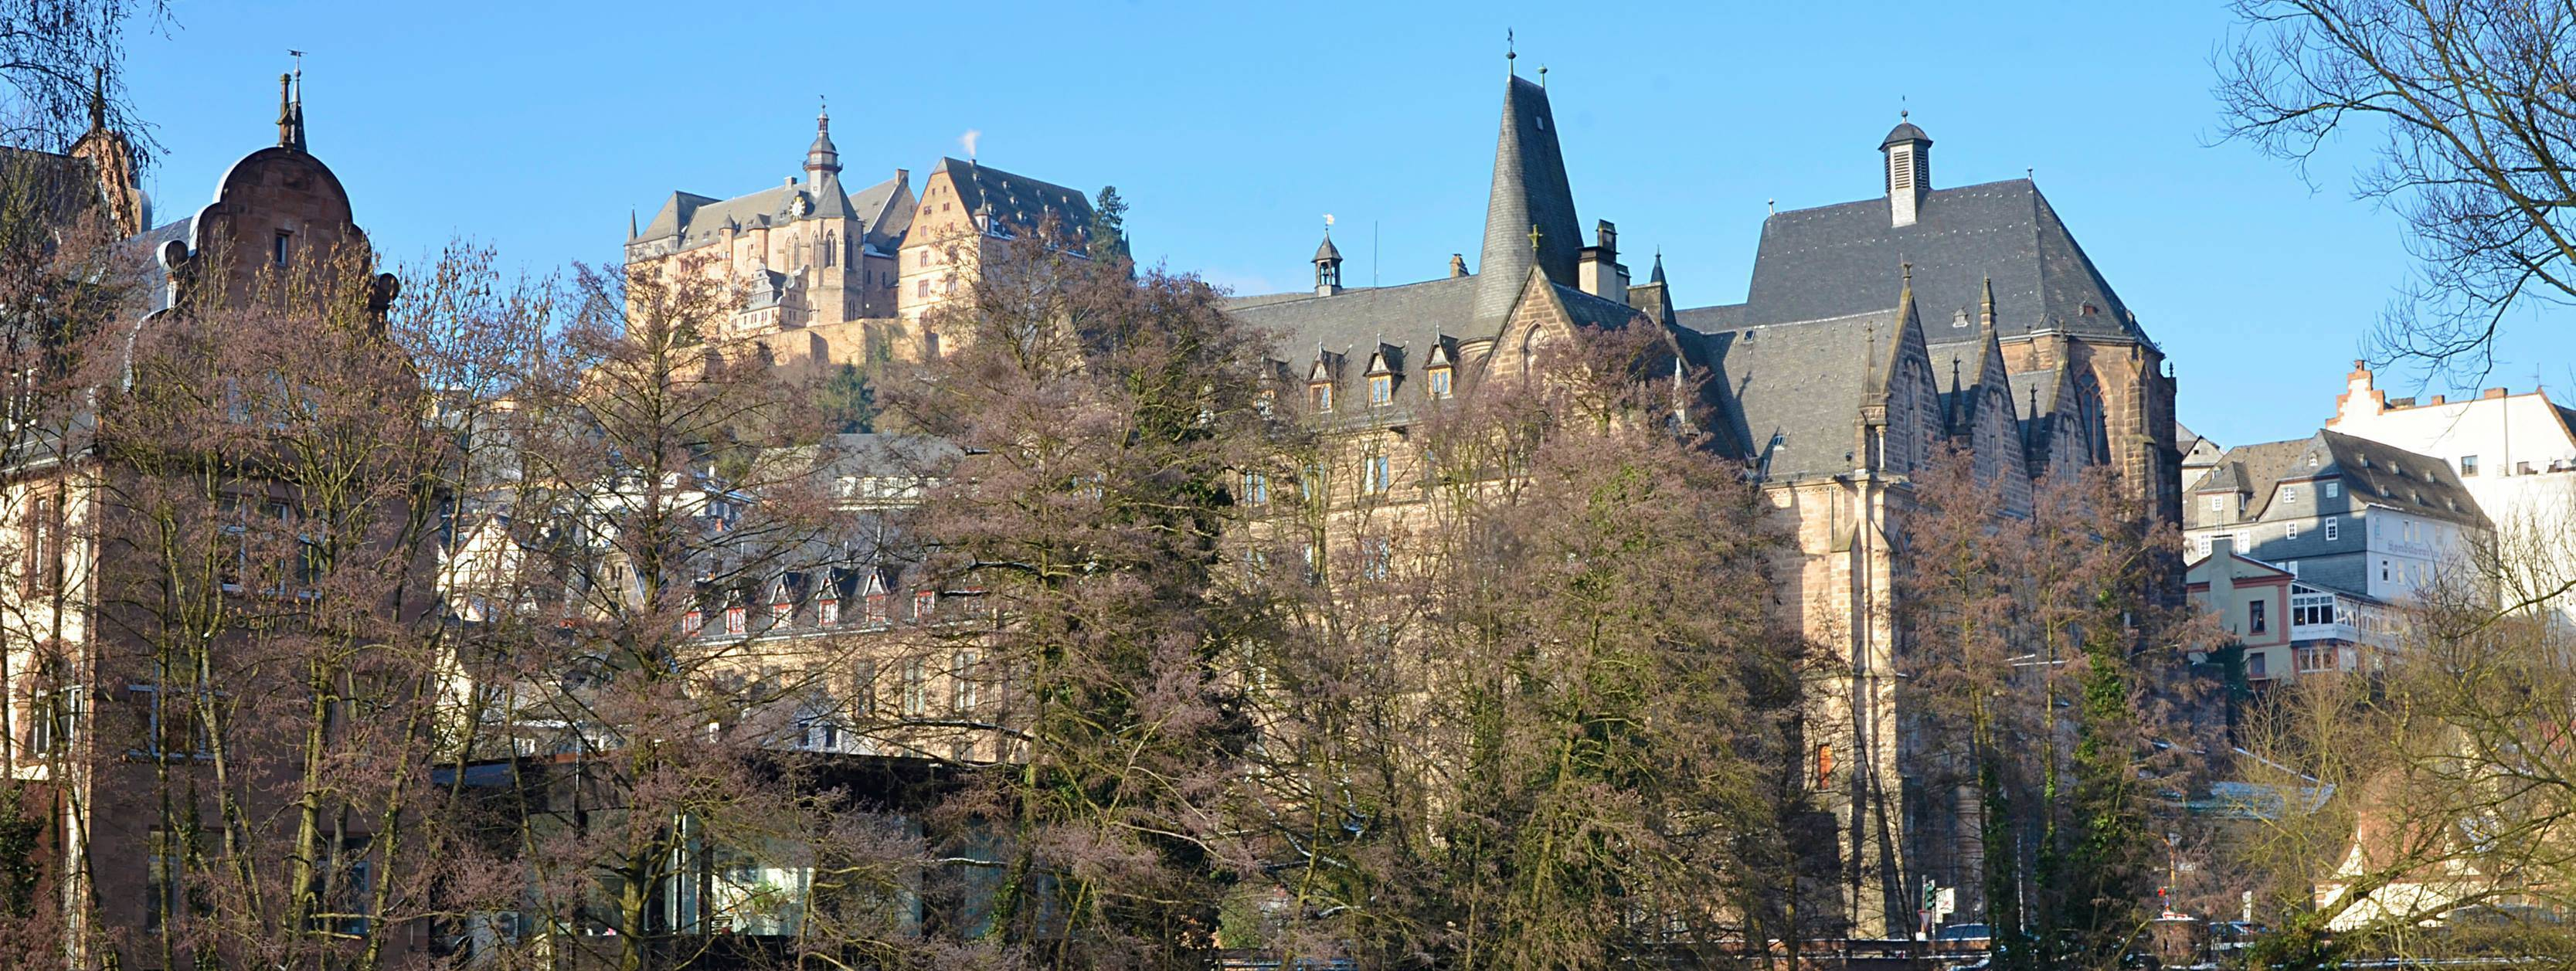 Uni Marburg Medizin studieren